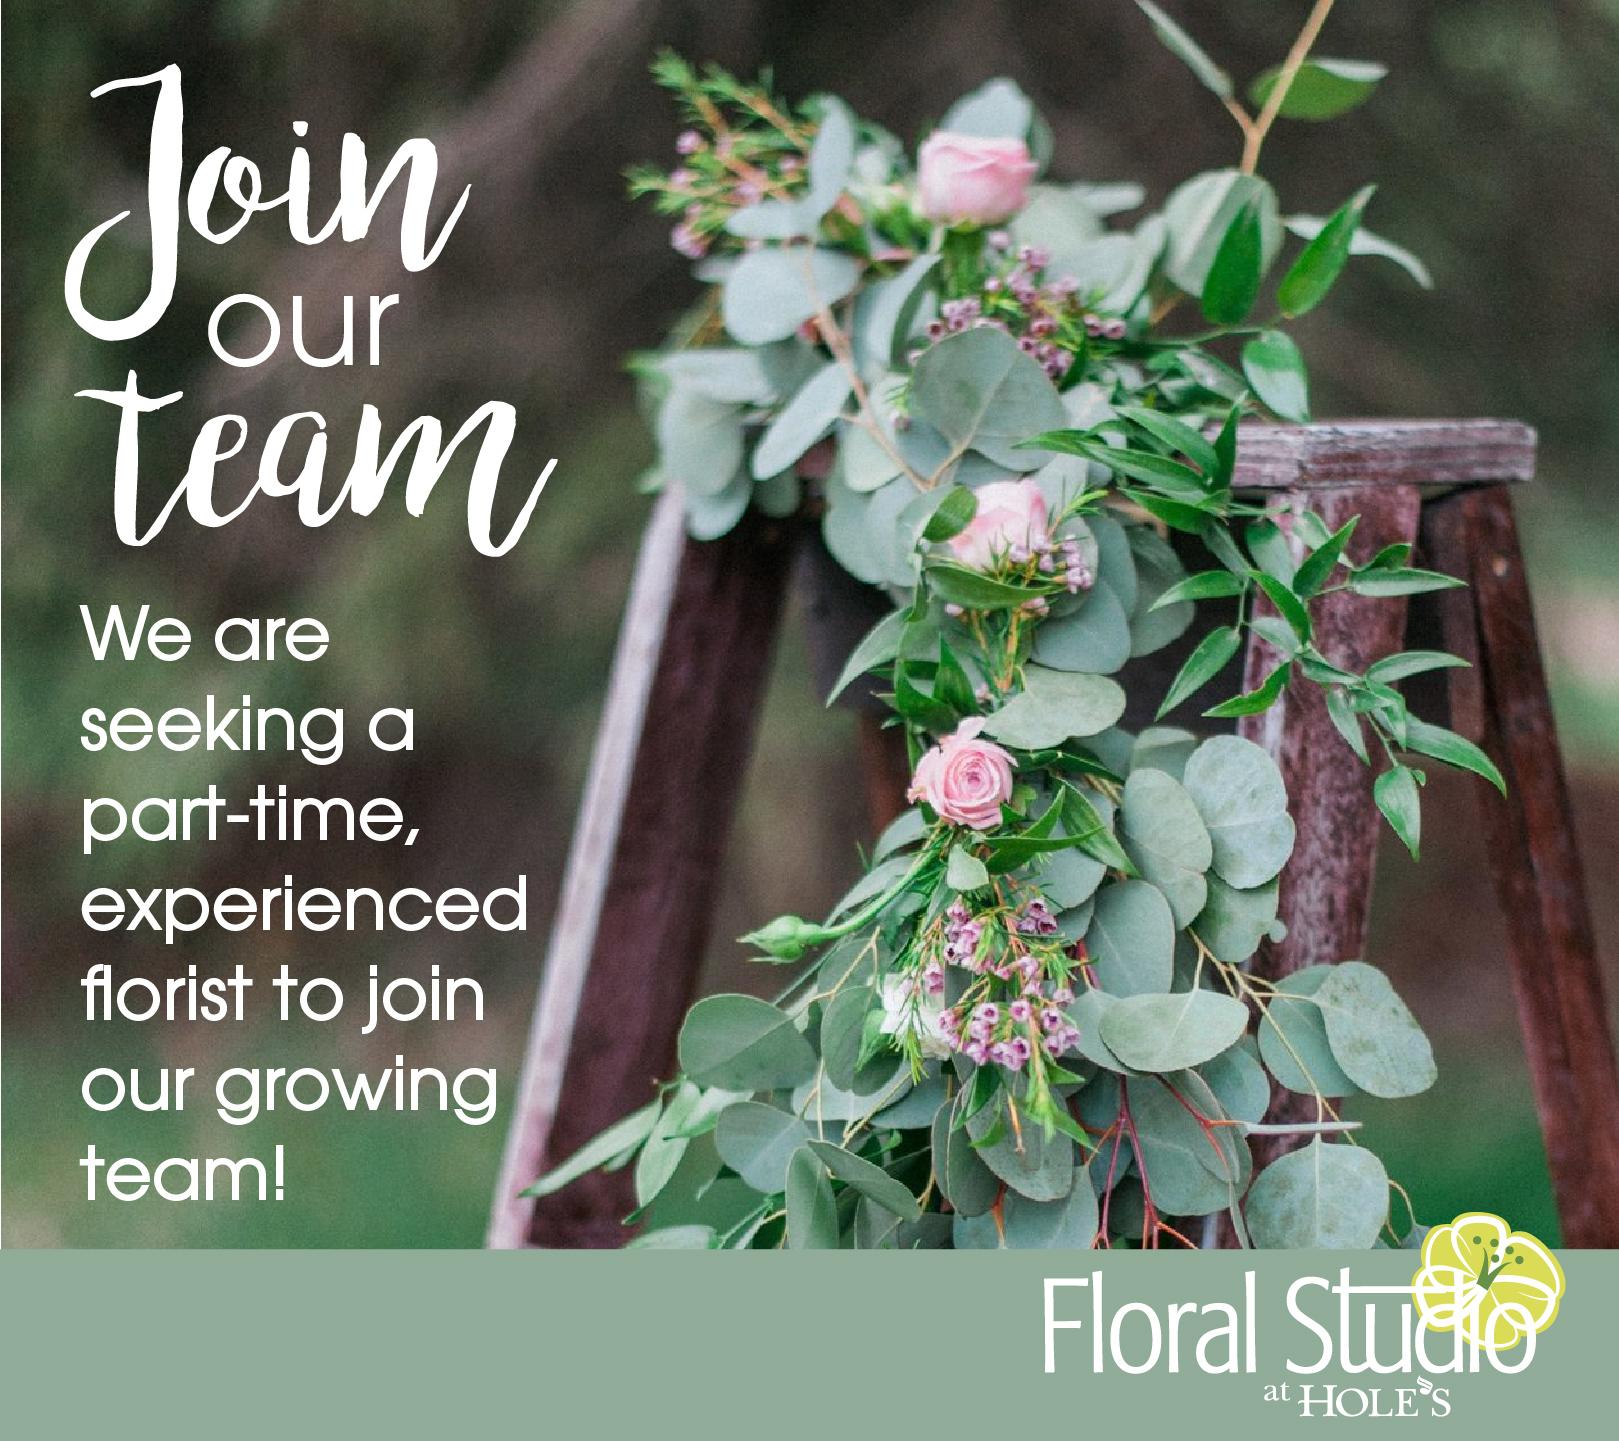 floral studio hiring ad1-03.jpg